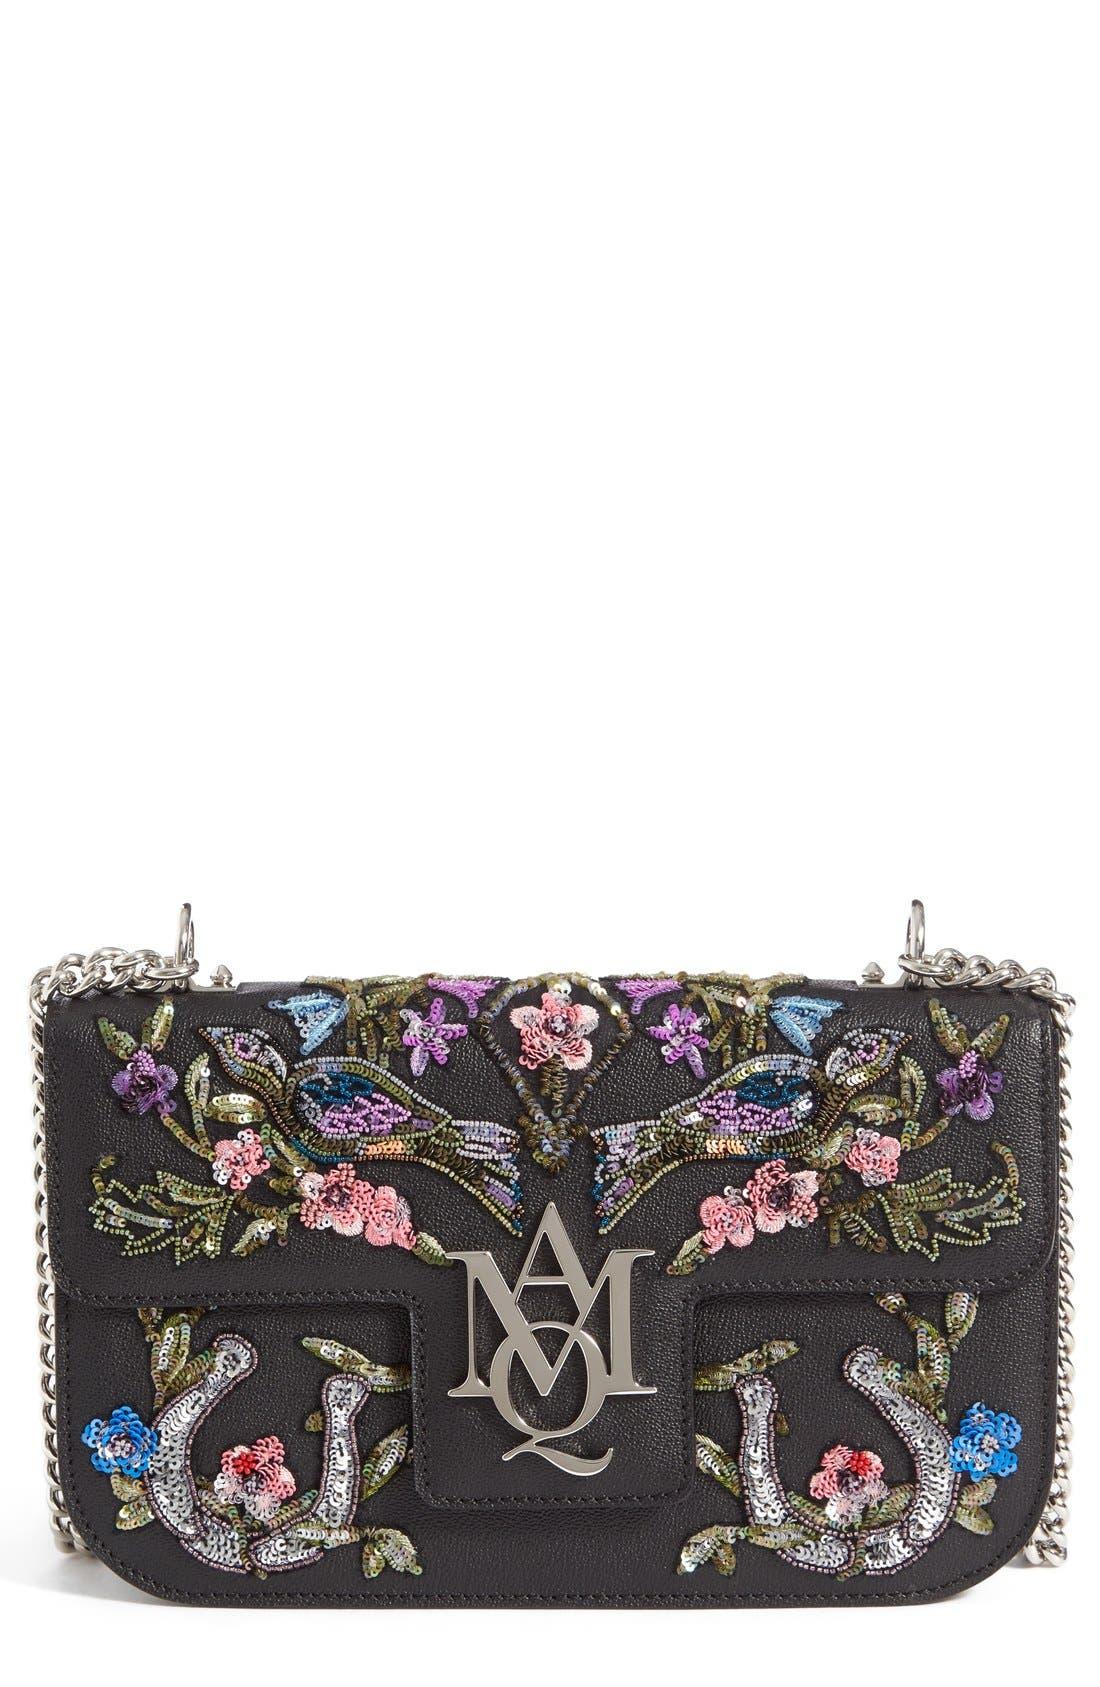 Main Image - Alexander McQueen Medium Insignia Calfskin Leather Shoulder Bag